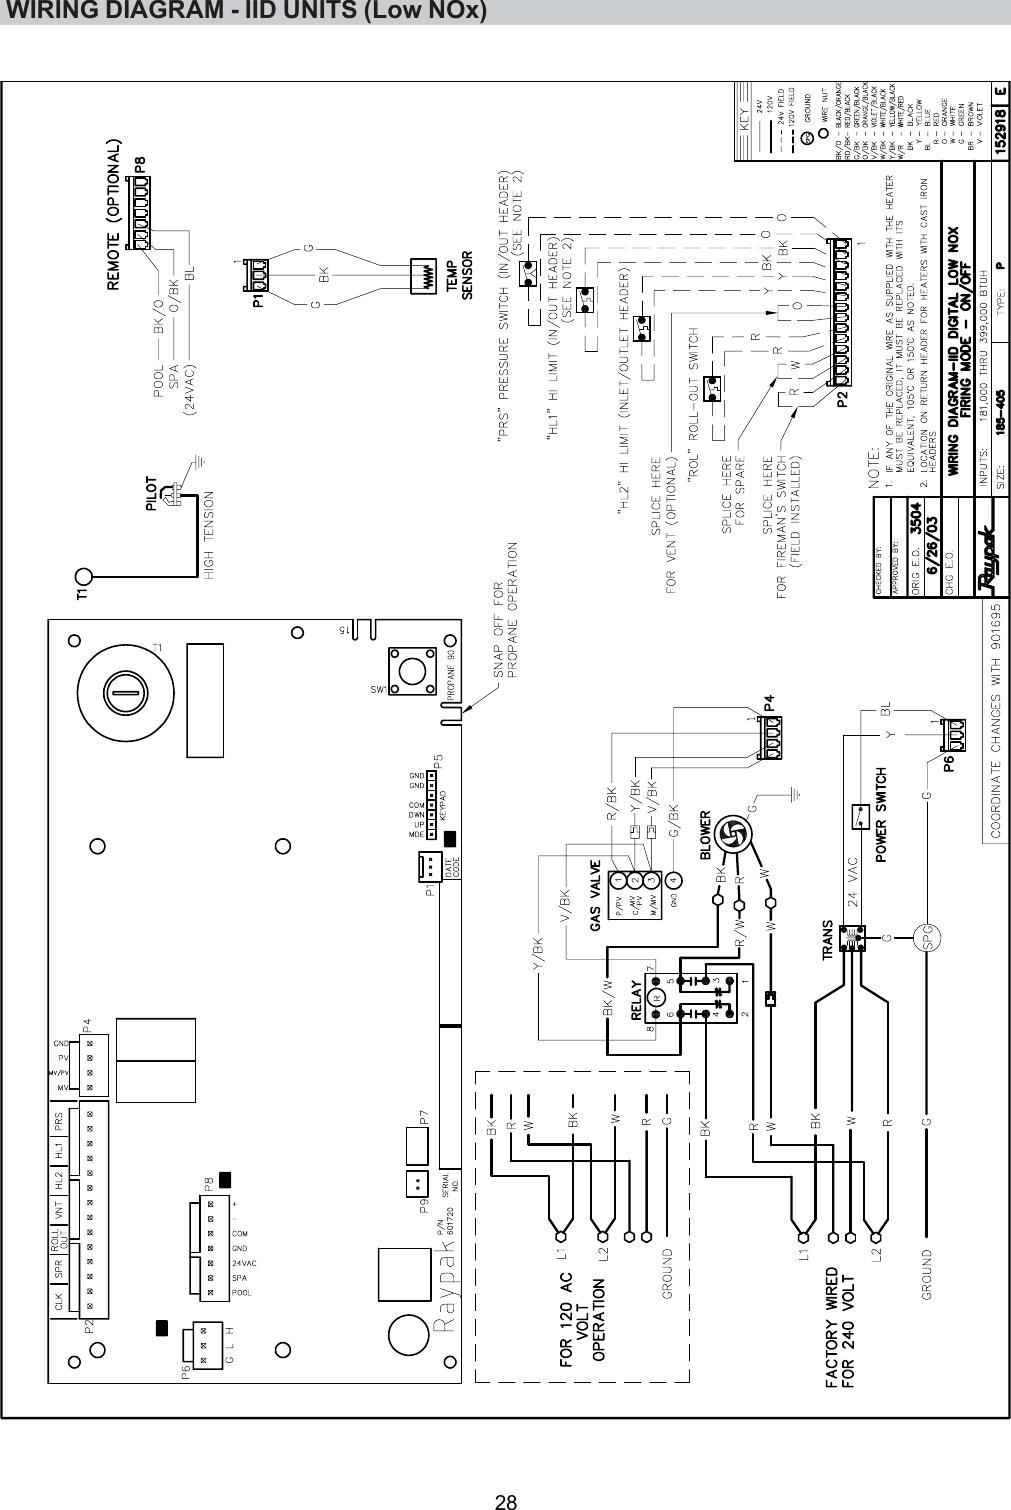 Herman Li Wiring Diagram - Today Diagram Database on